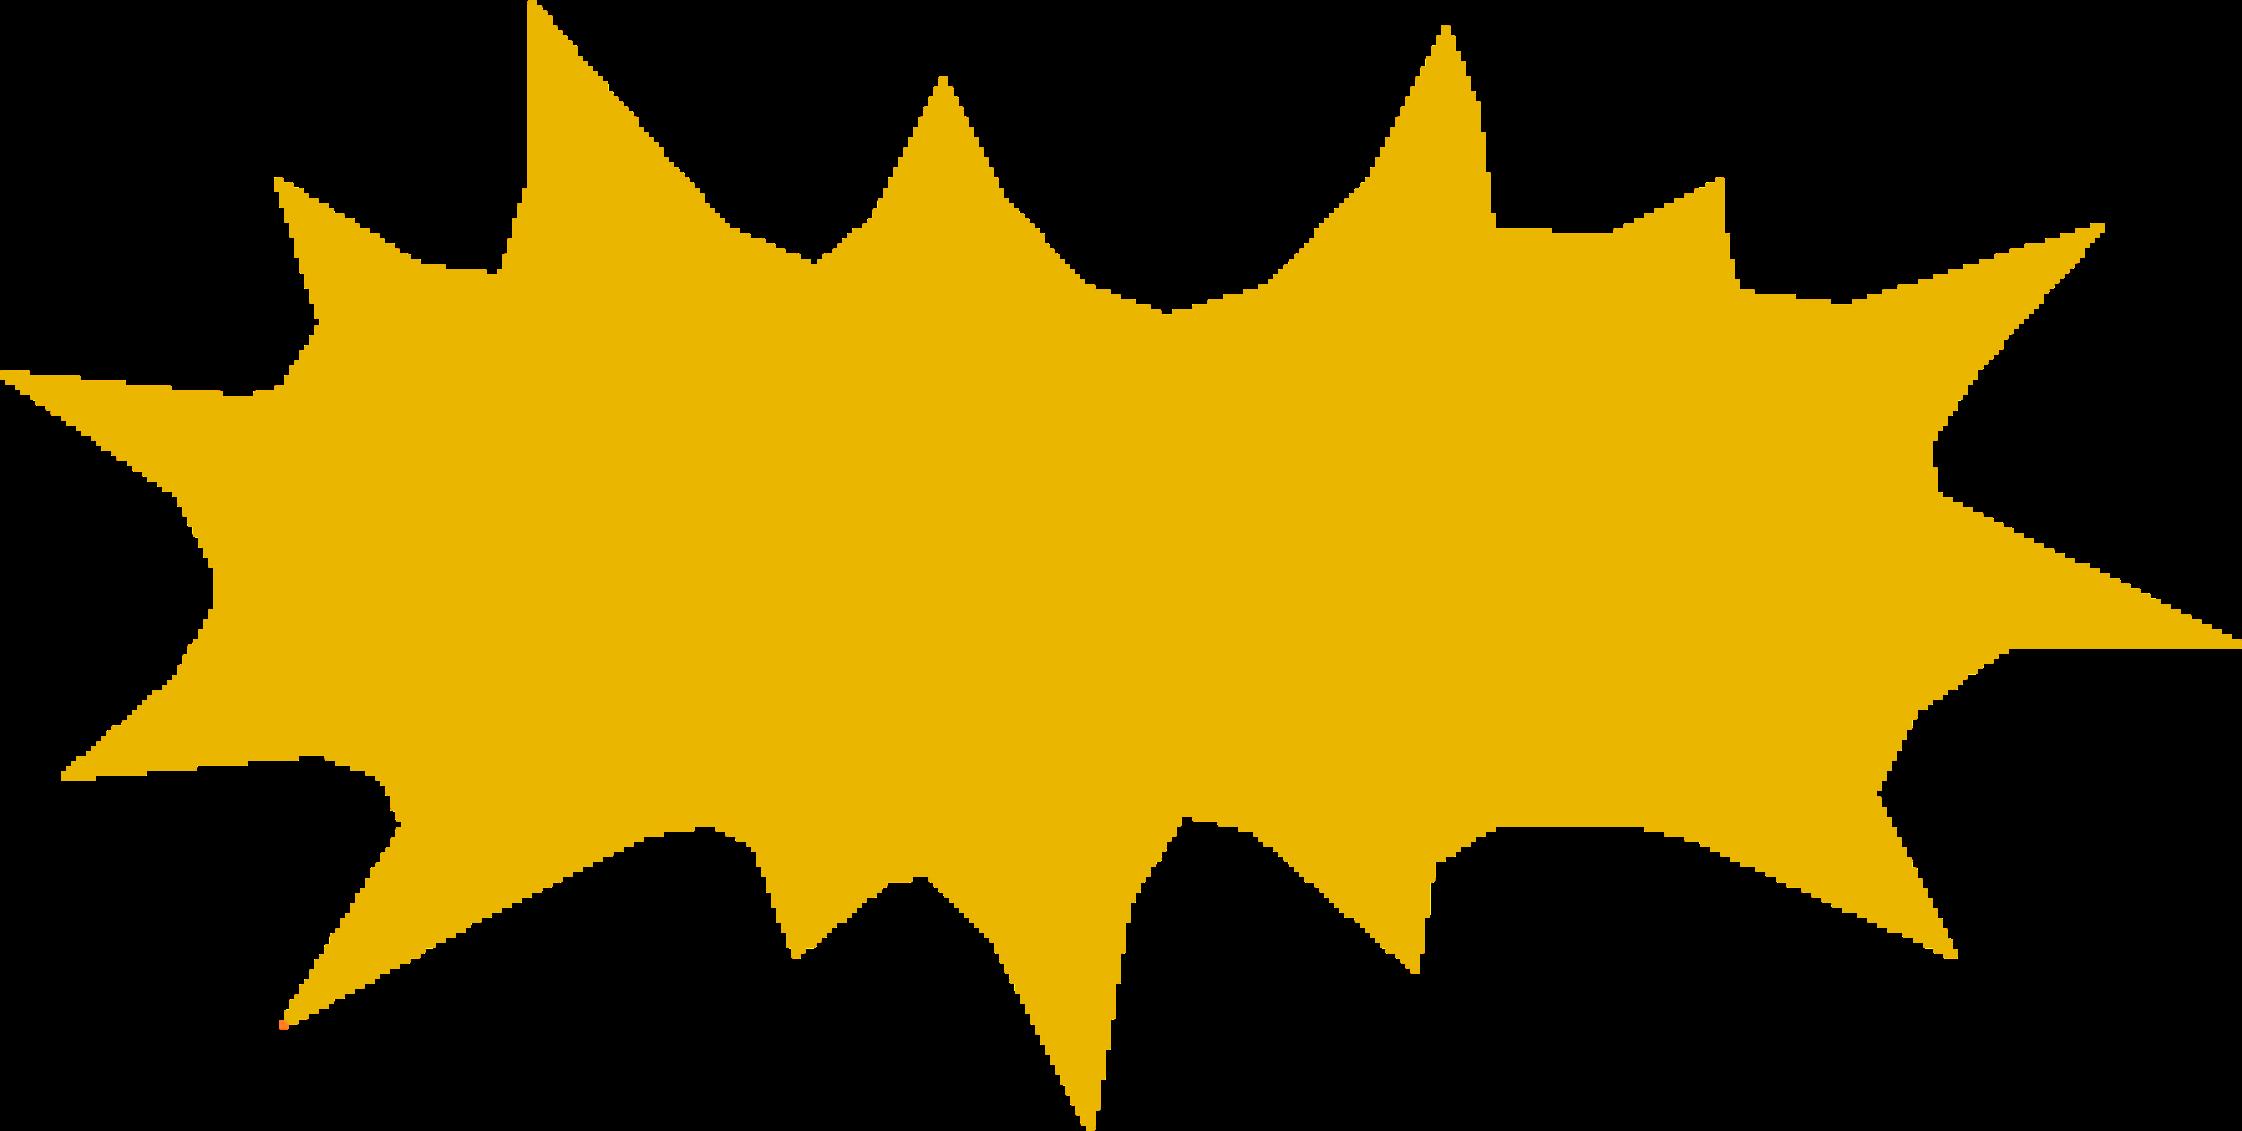 Burst clipart yellow. Big image png